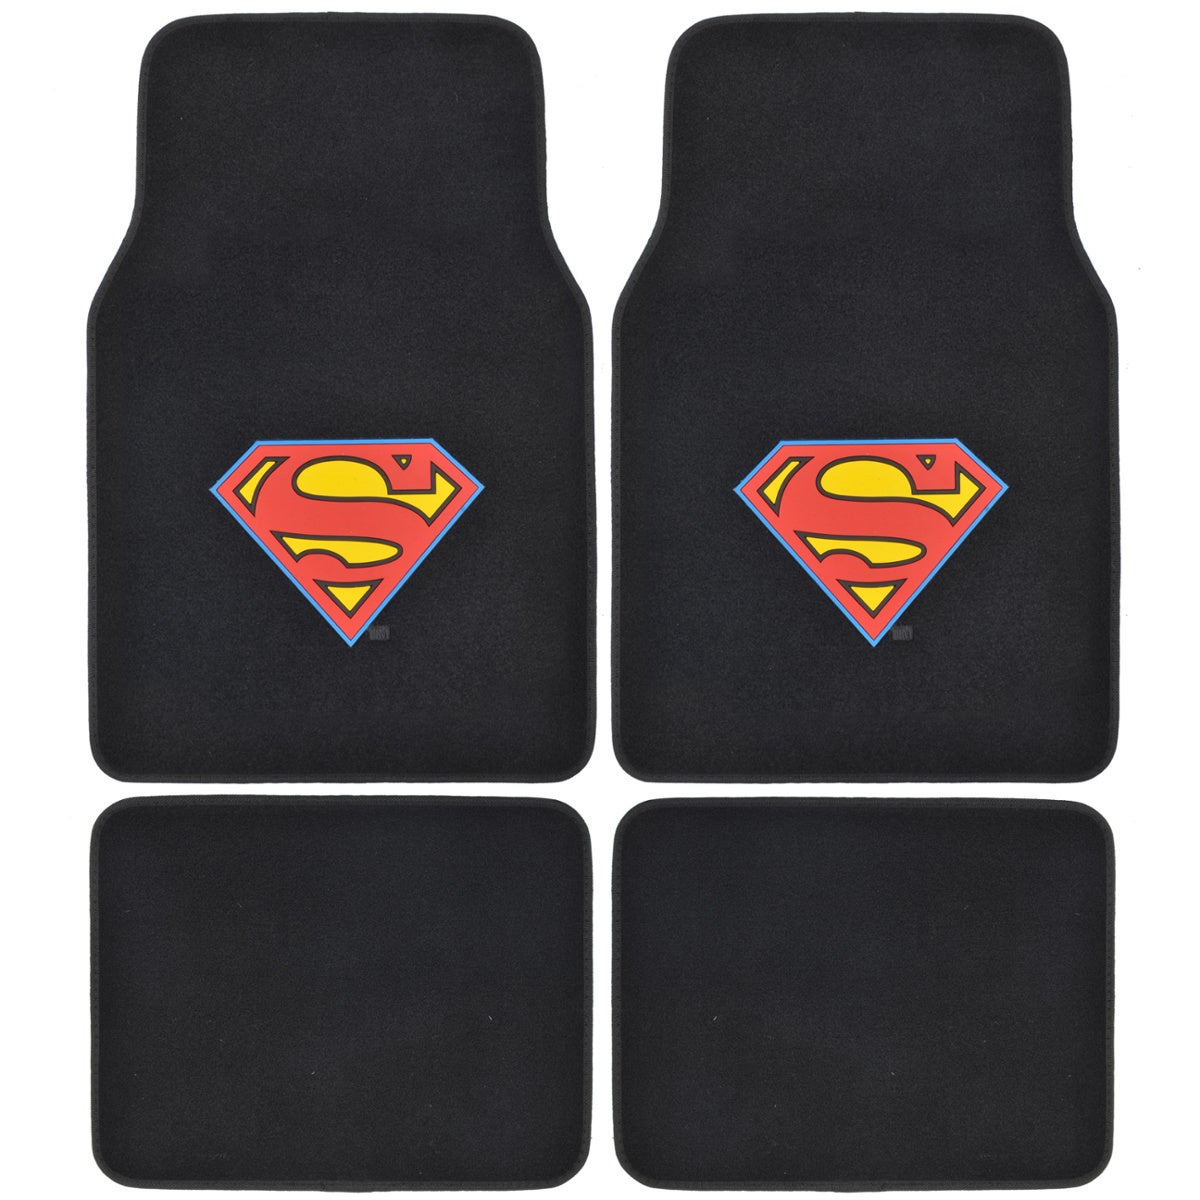 Warner Brothers BDK Superman Floor Mats for Car 4-piece O...